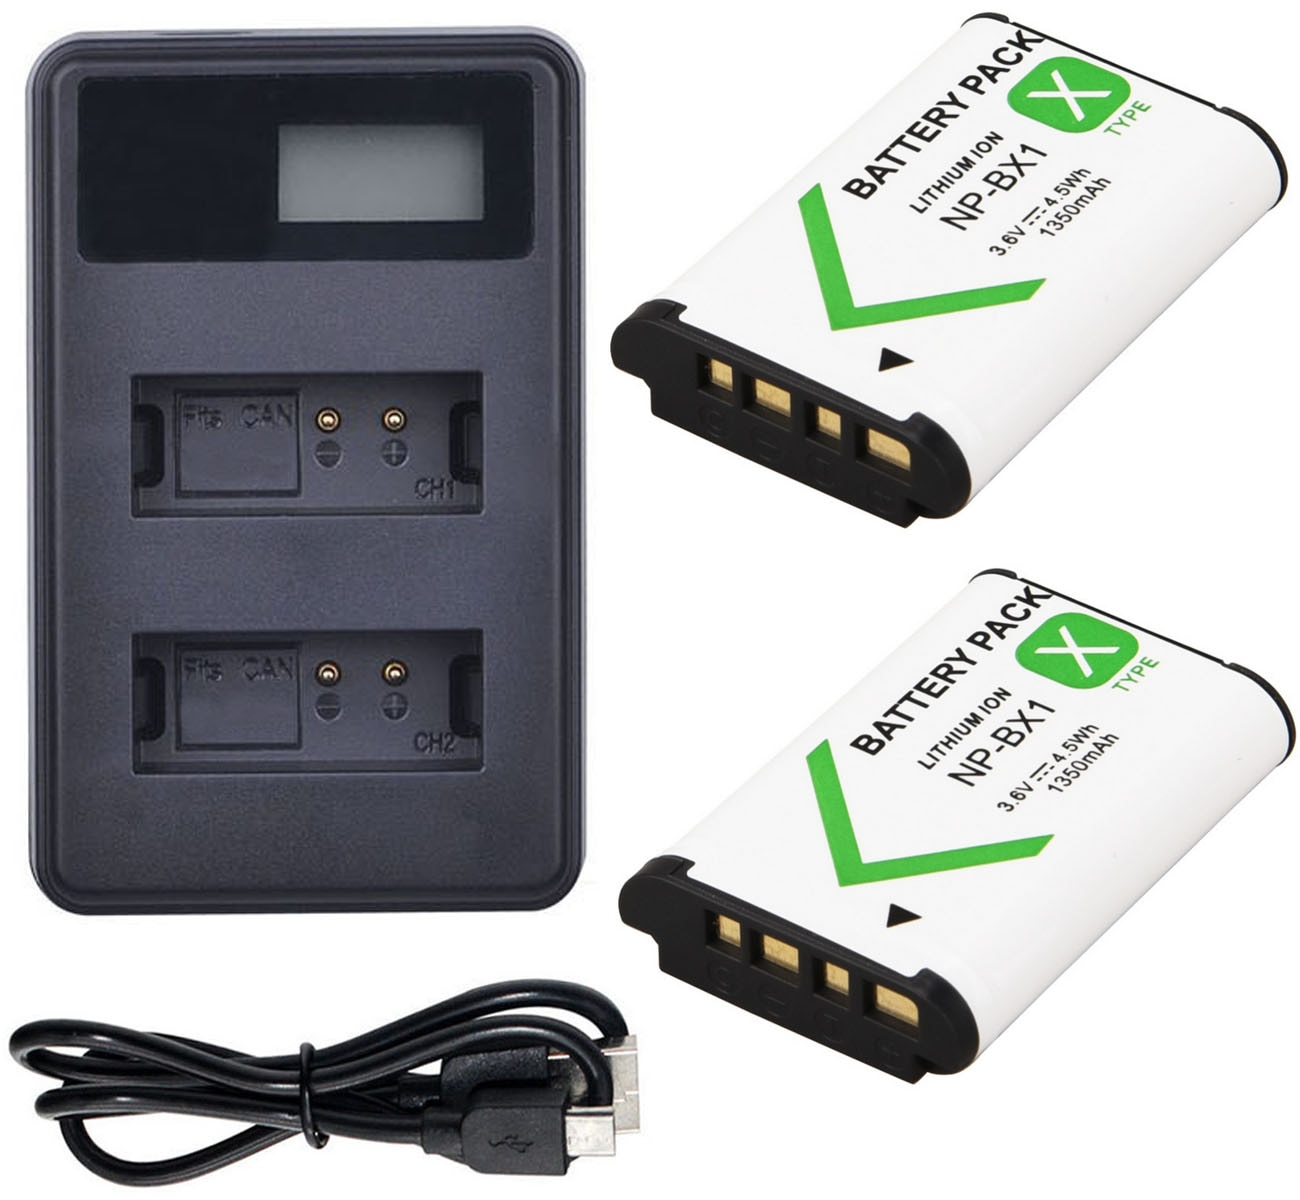 Batería + cargador para Sony cyber-shot DSC-RX1RM2, DSC-RX1R II, DSC-RX100M2, DSC-RX100, DSC-RX100 II, DSC-RX100II cámara Digital